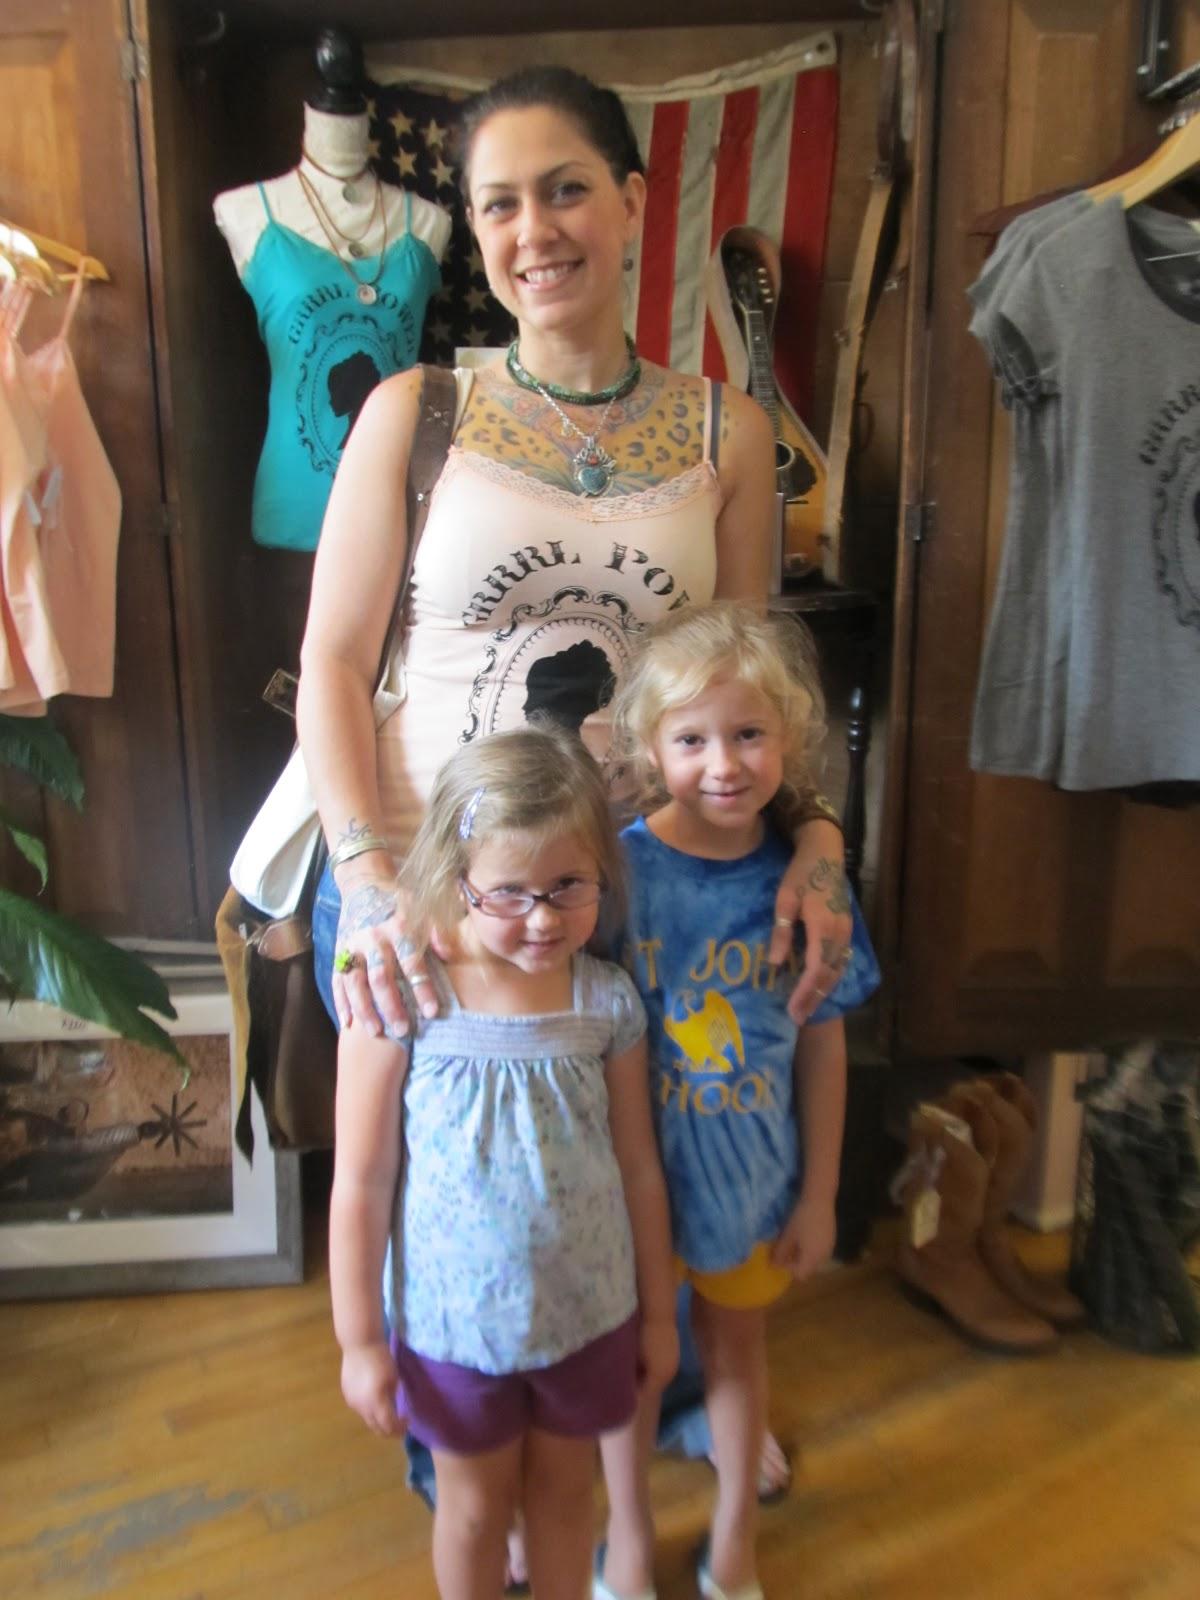 Danielle Colby's kids